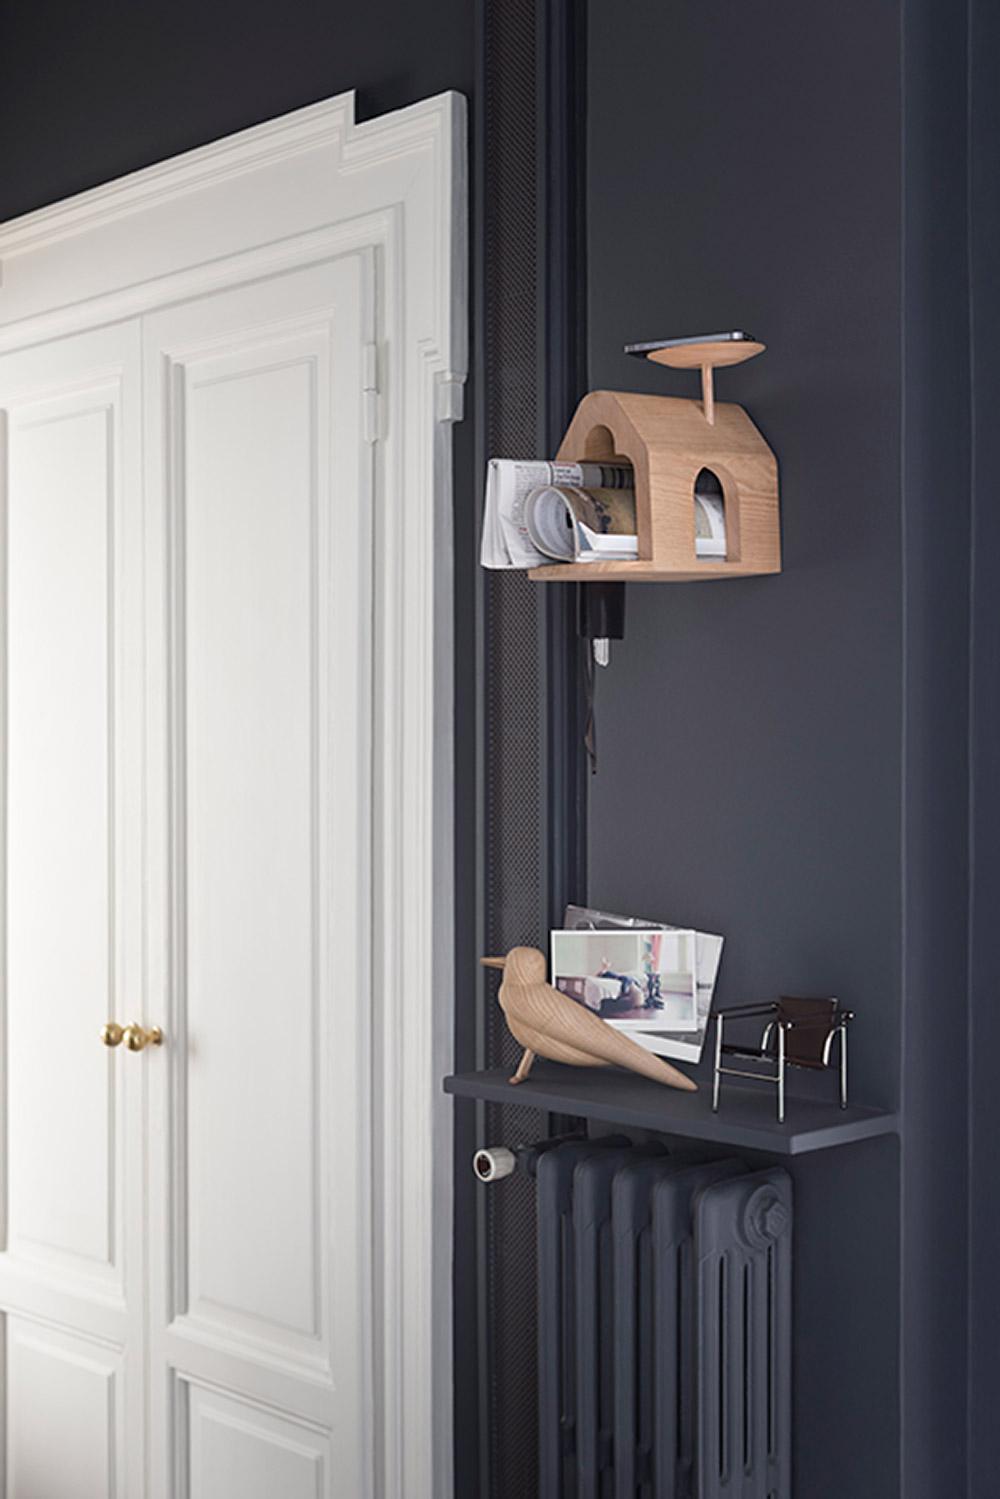 The Birdhouse ,The Bird. שניים משלושת האובייקטים שעיצב חיימה חיון בסדרה מוגבלת מעץ הפואולוניה